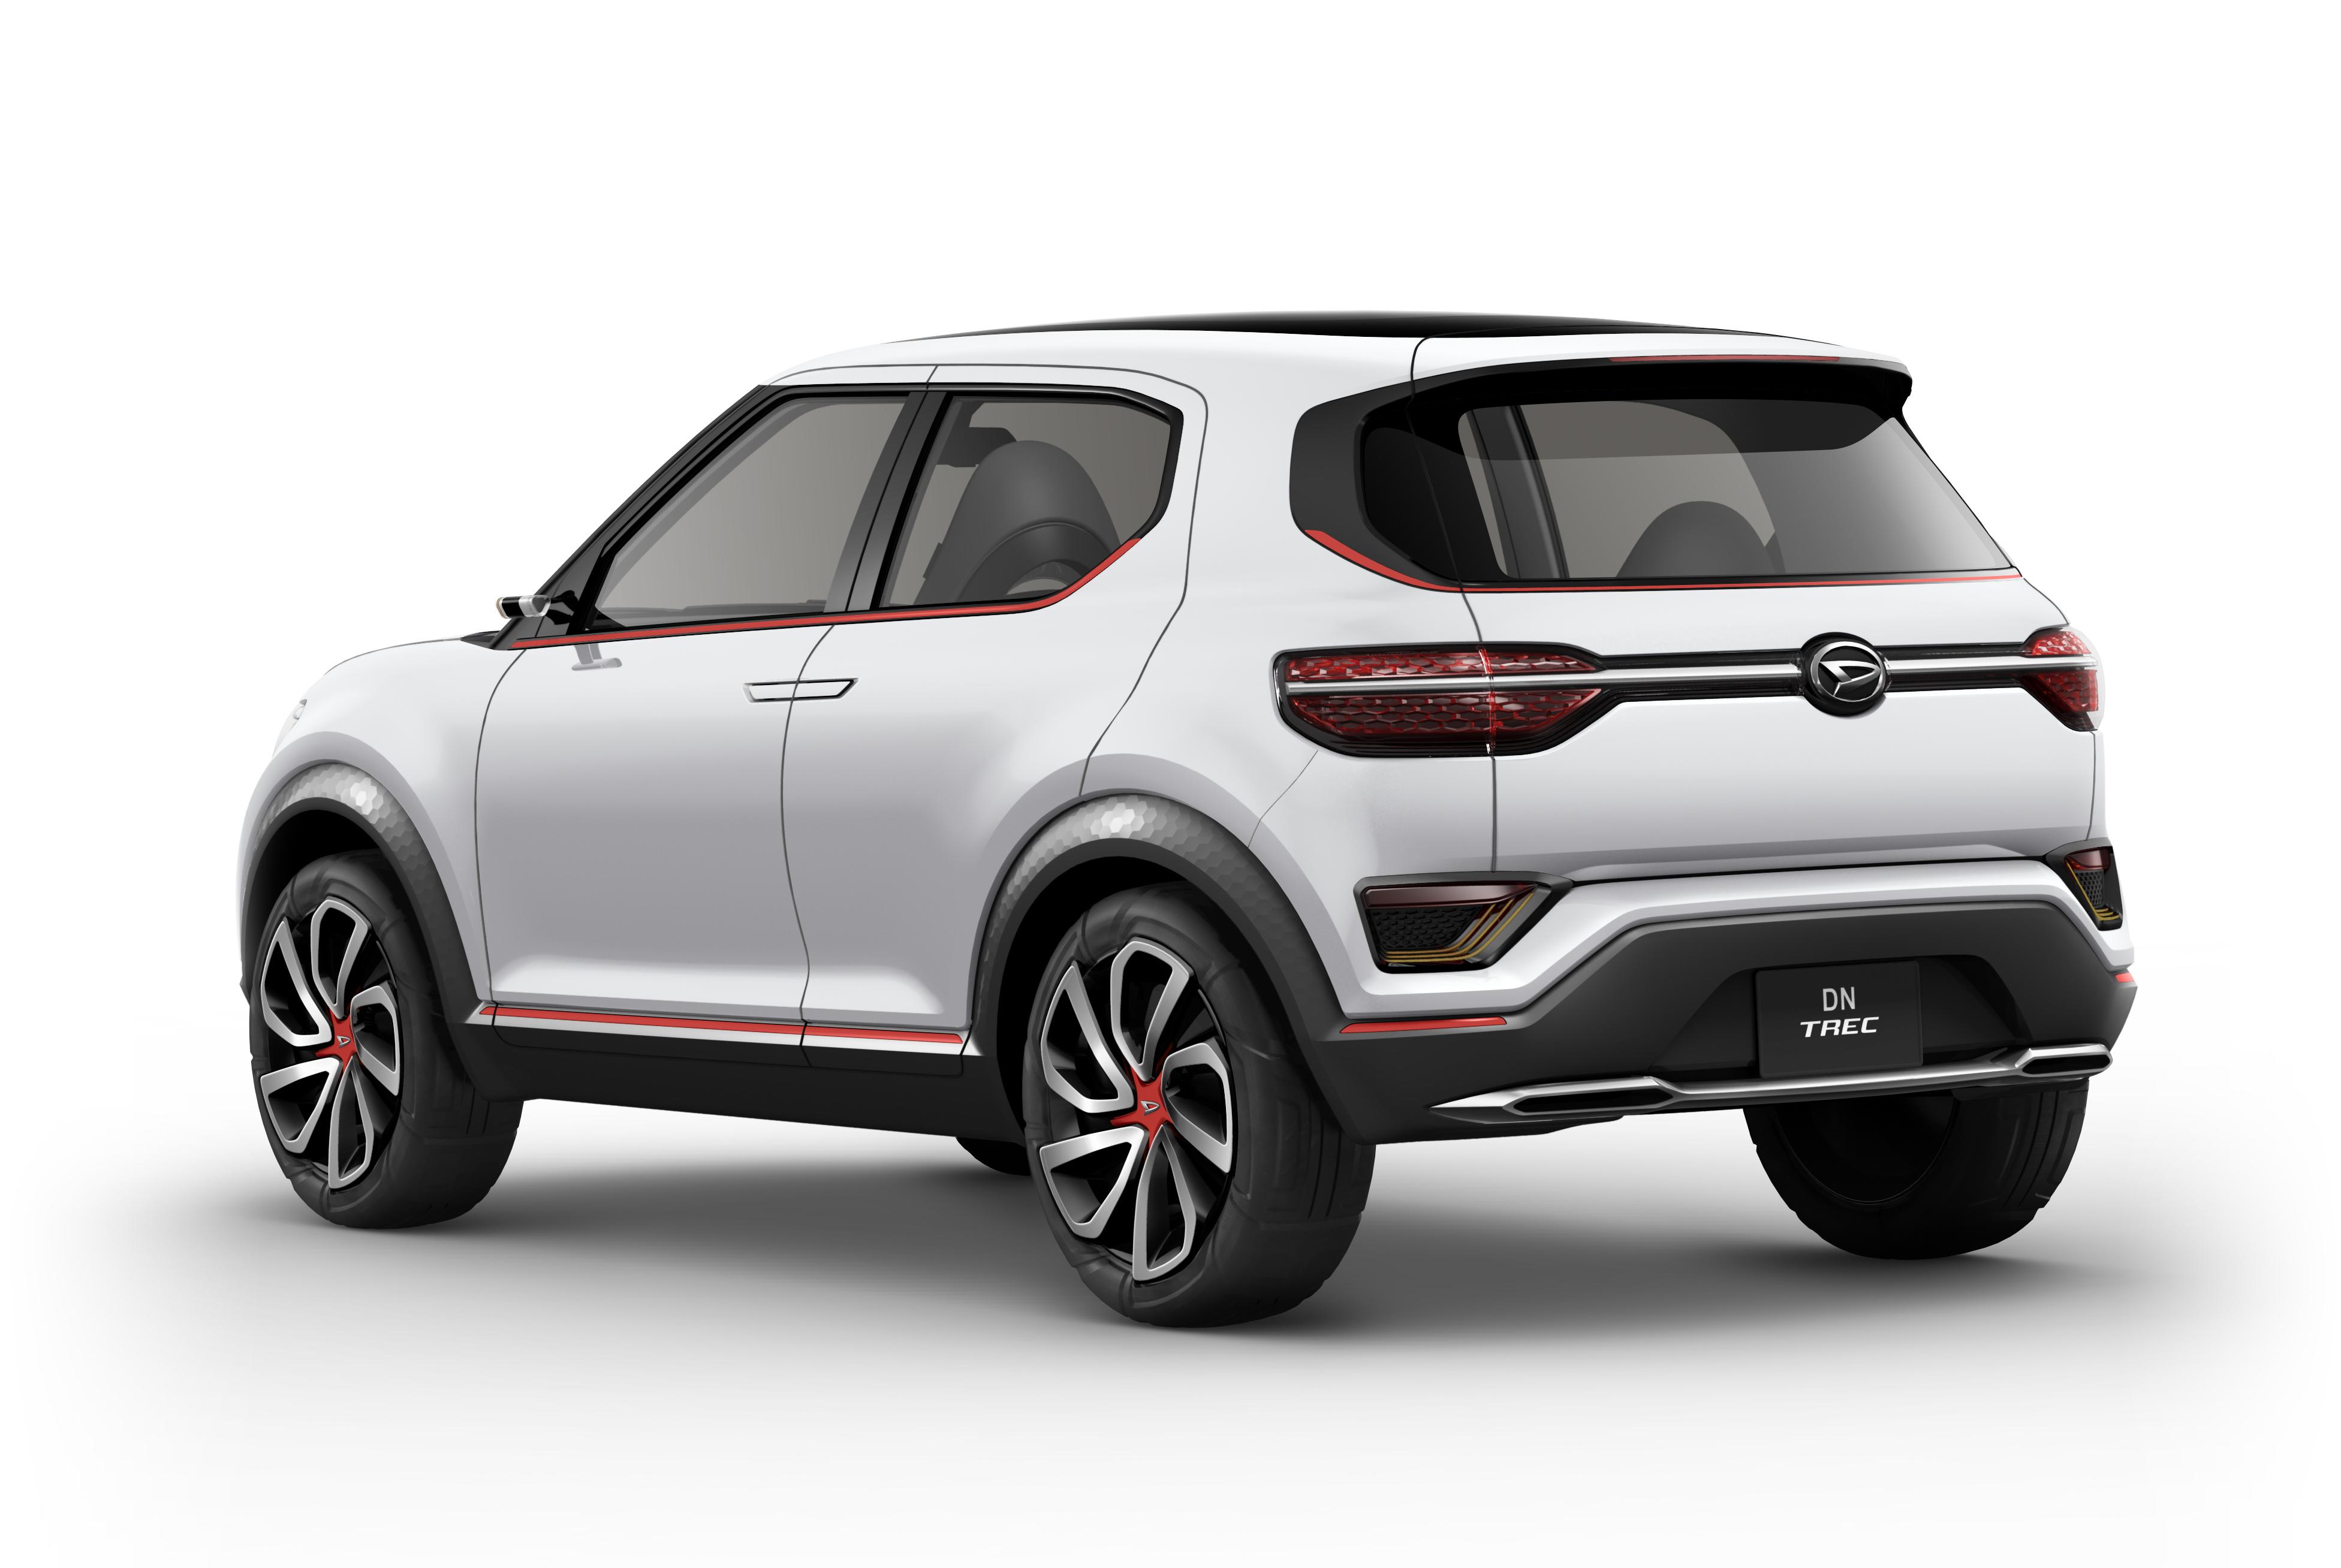 2019 - [Toyota] Raize 2017-Daihatsu-DN-Trec-Concept-03